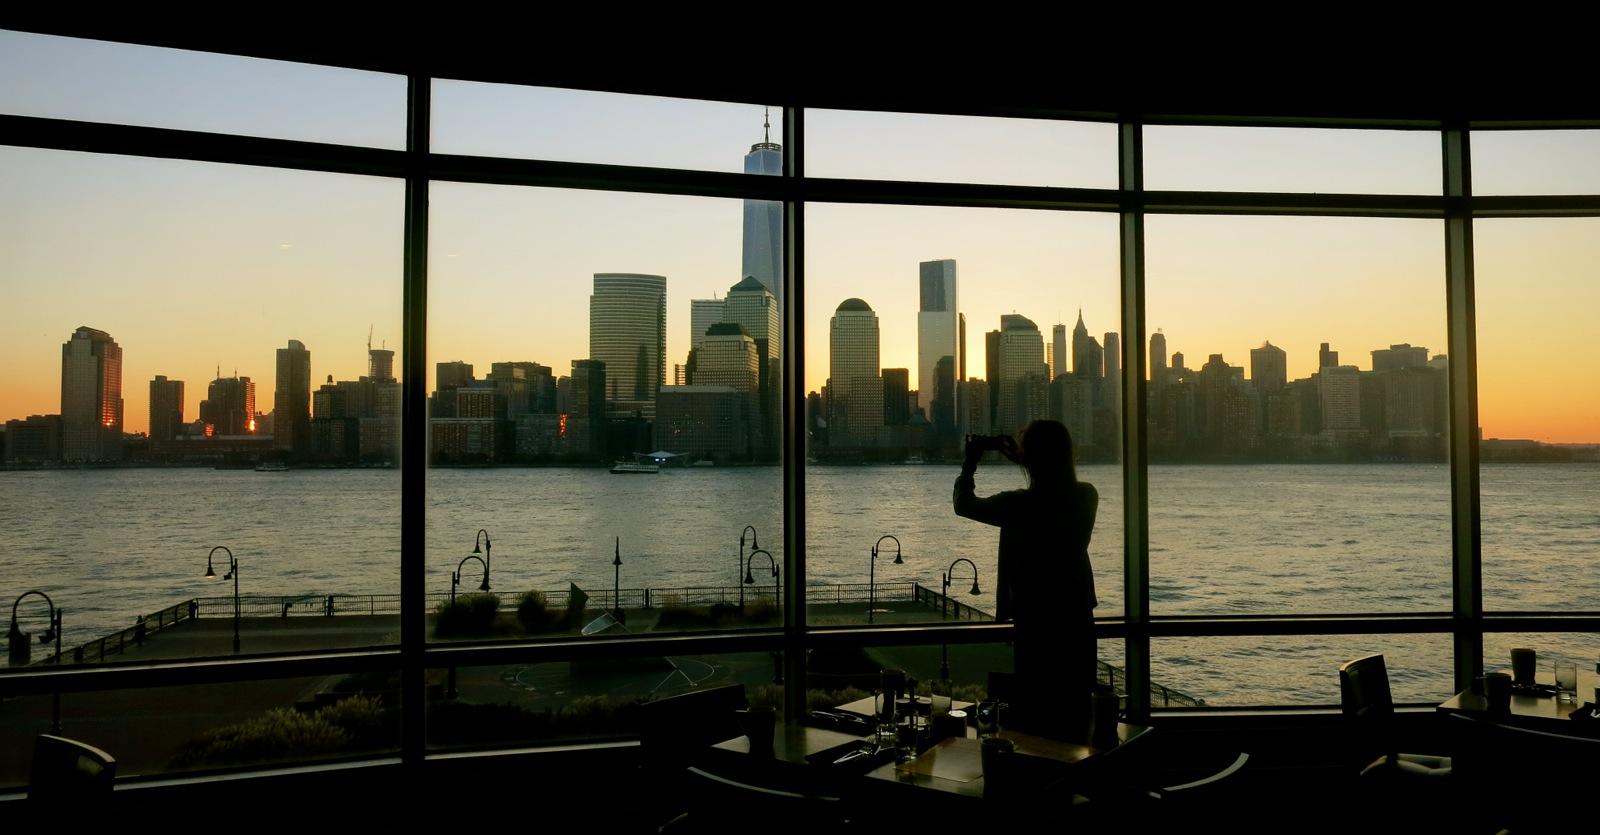 Jersey City, NJ: The New Art and Food Powerhouse